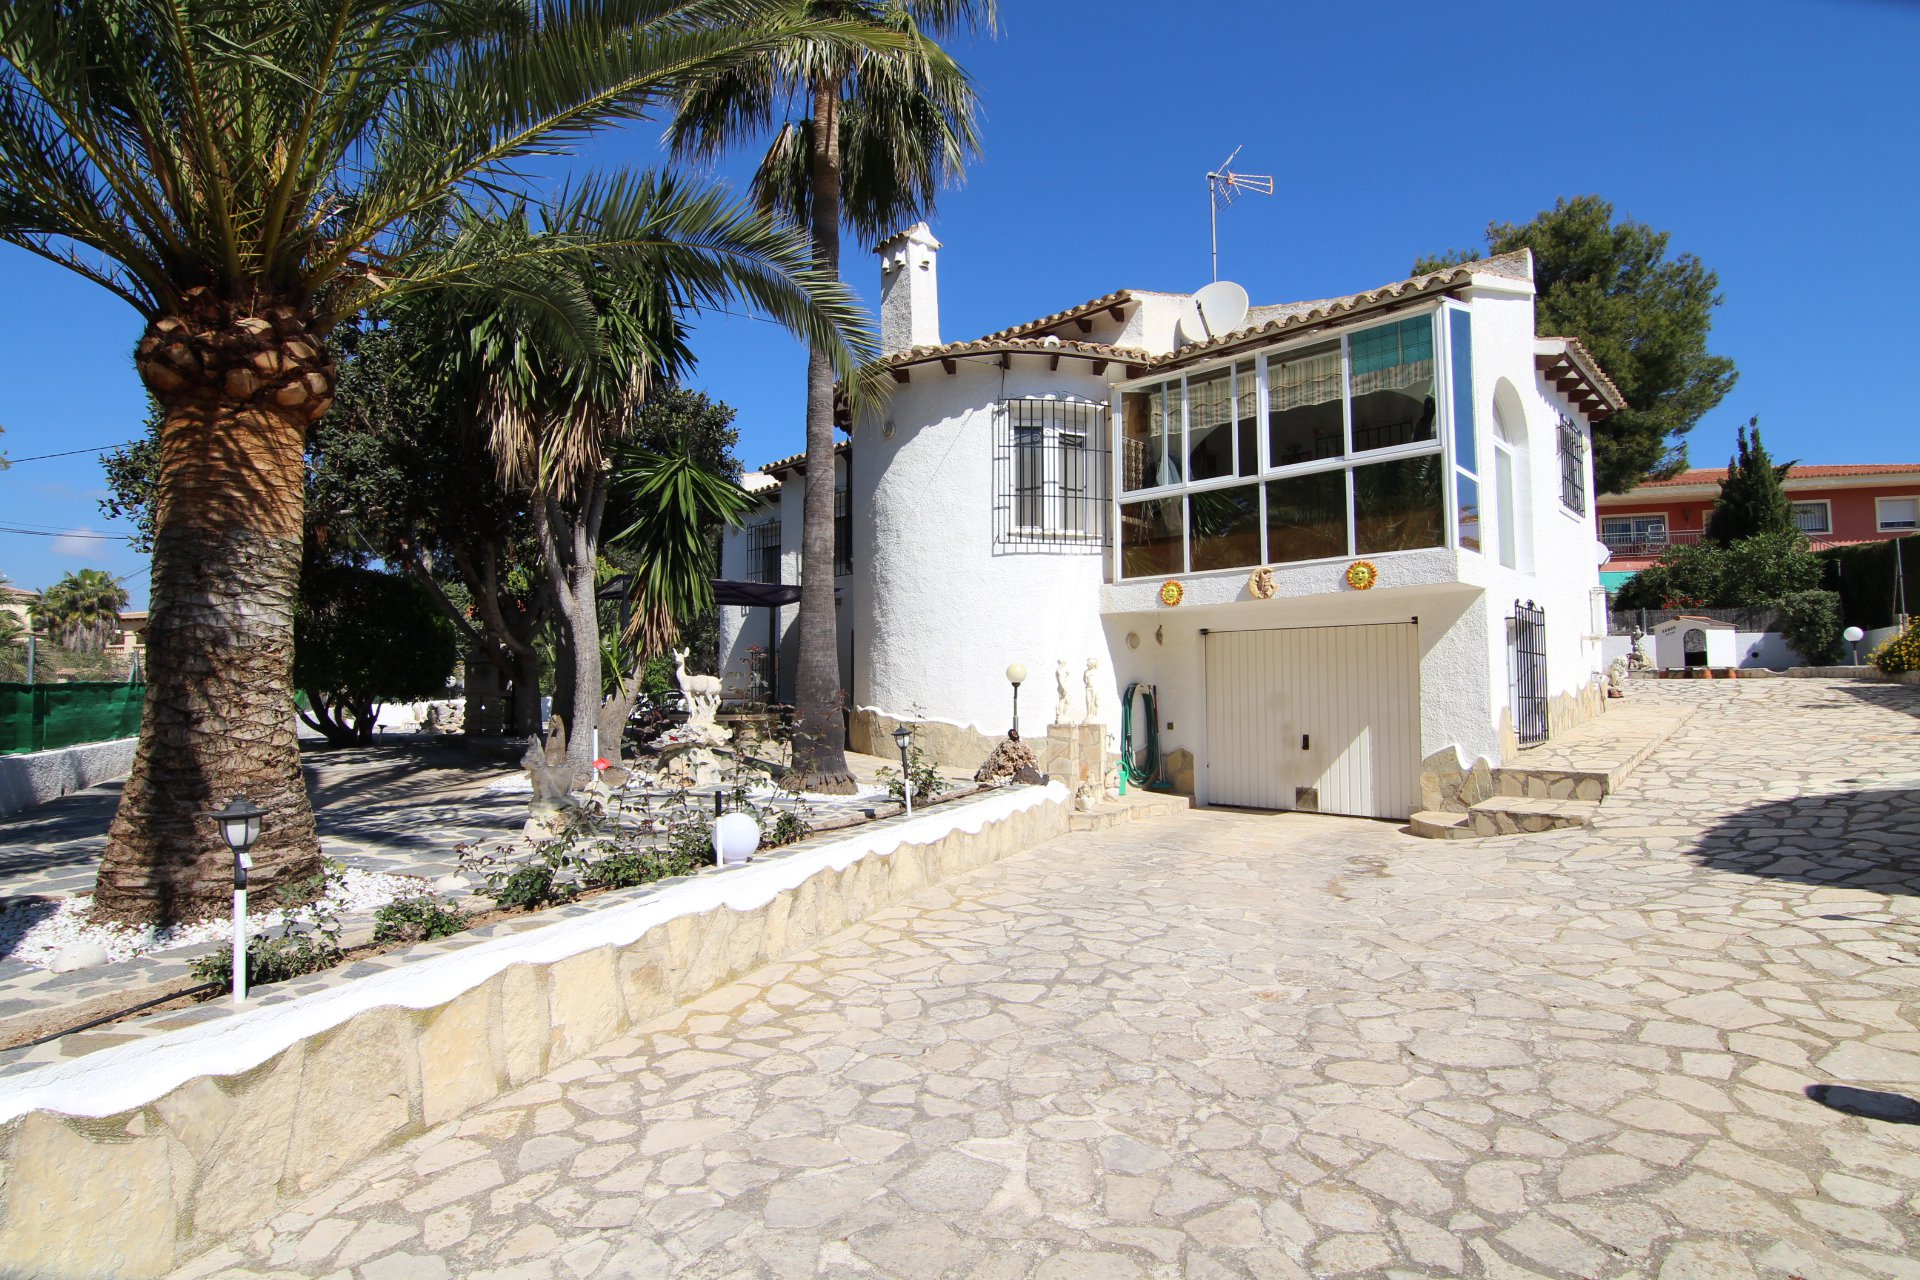 Mooie villa met 3 slaapkamers in Calpe